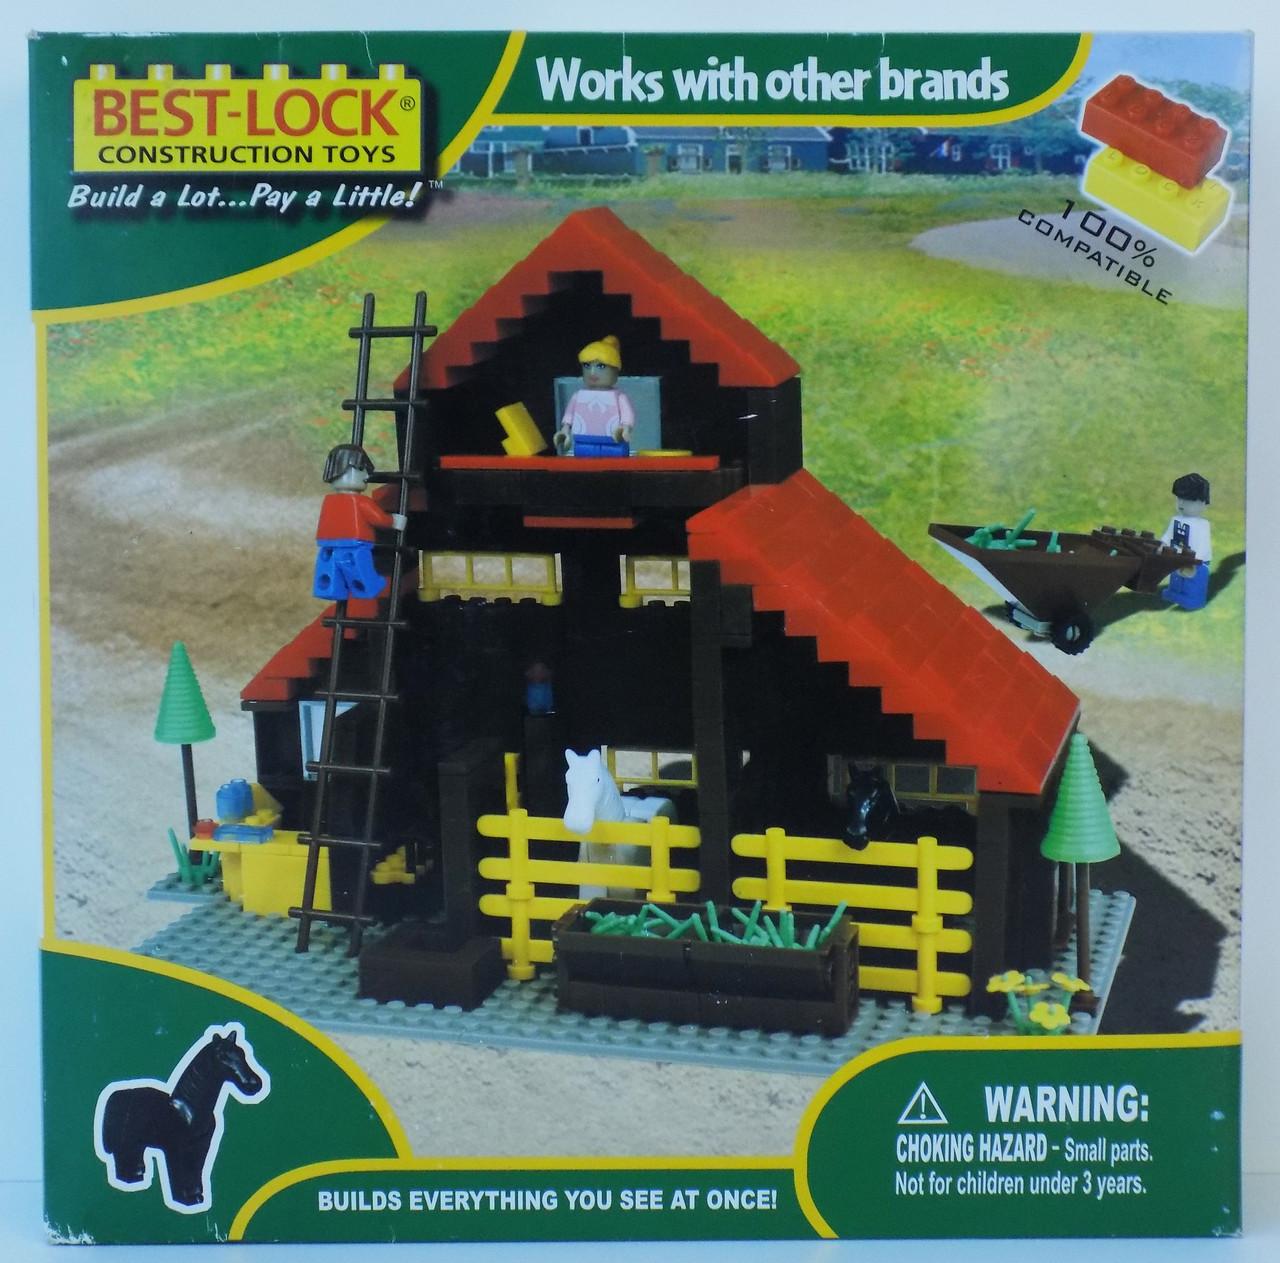 Конструктор Best Lock ферма 24040